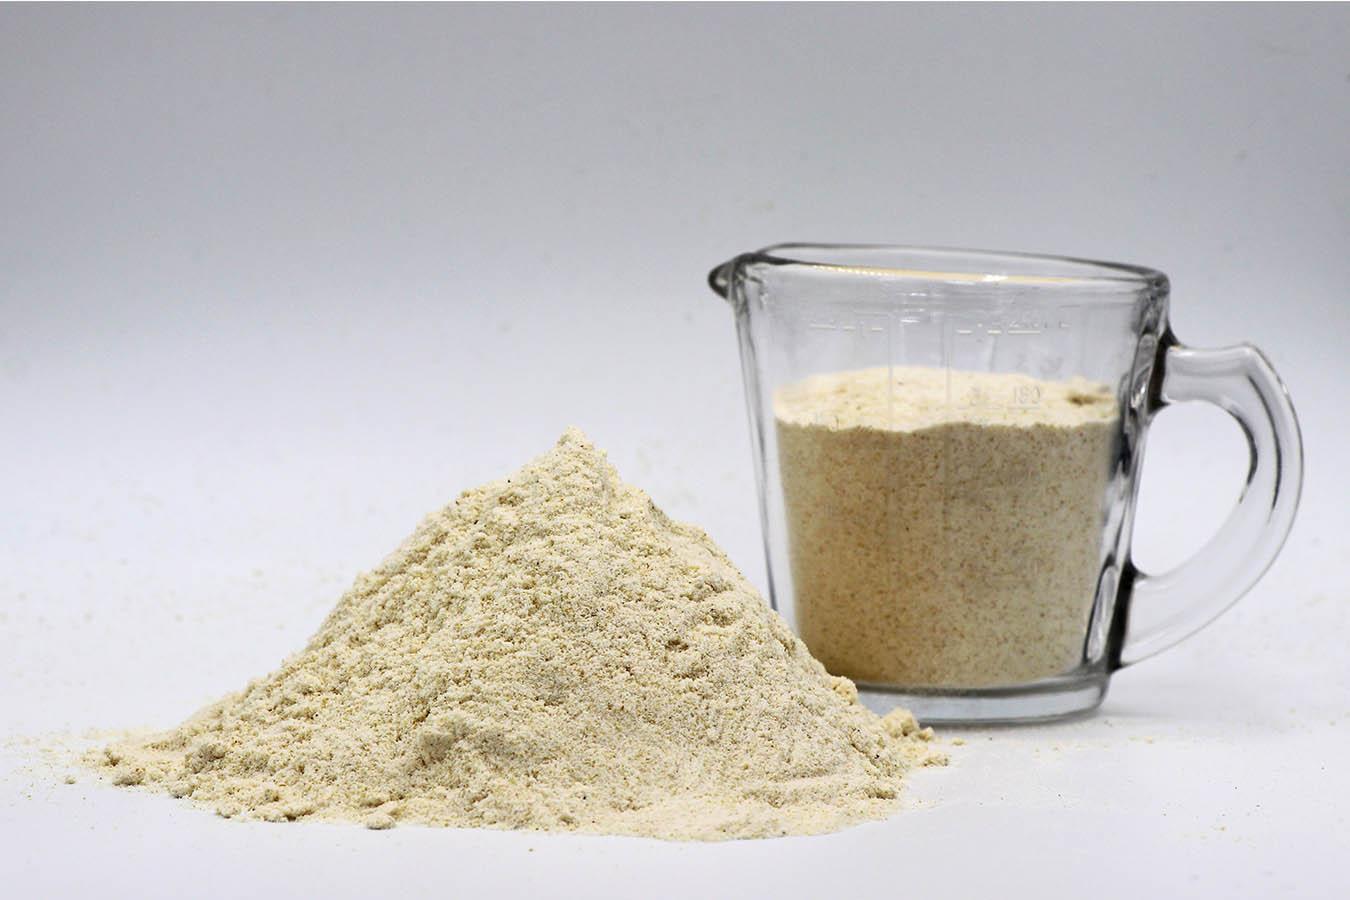 harina maseca harina de maiz harina natural corn flour harina de maiz nixtamalizado